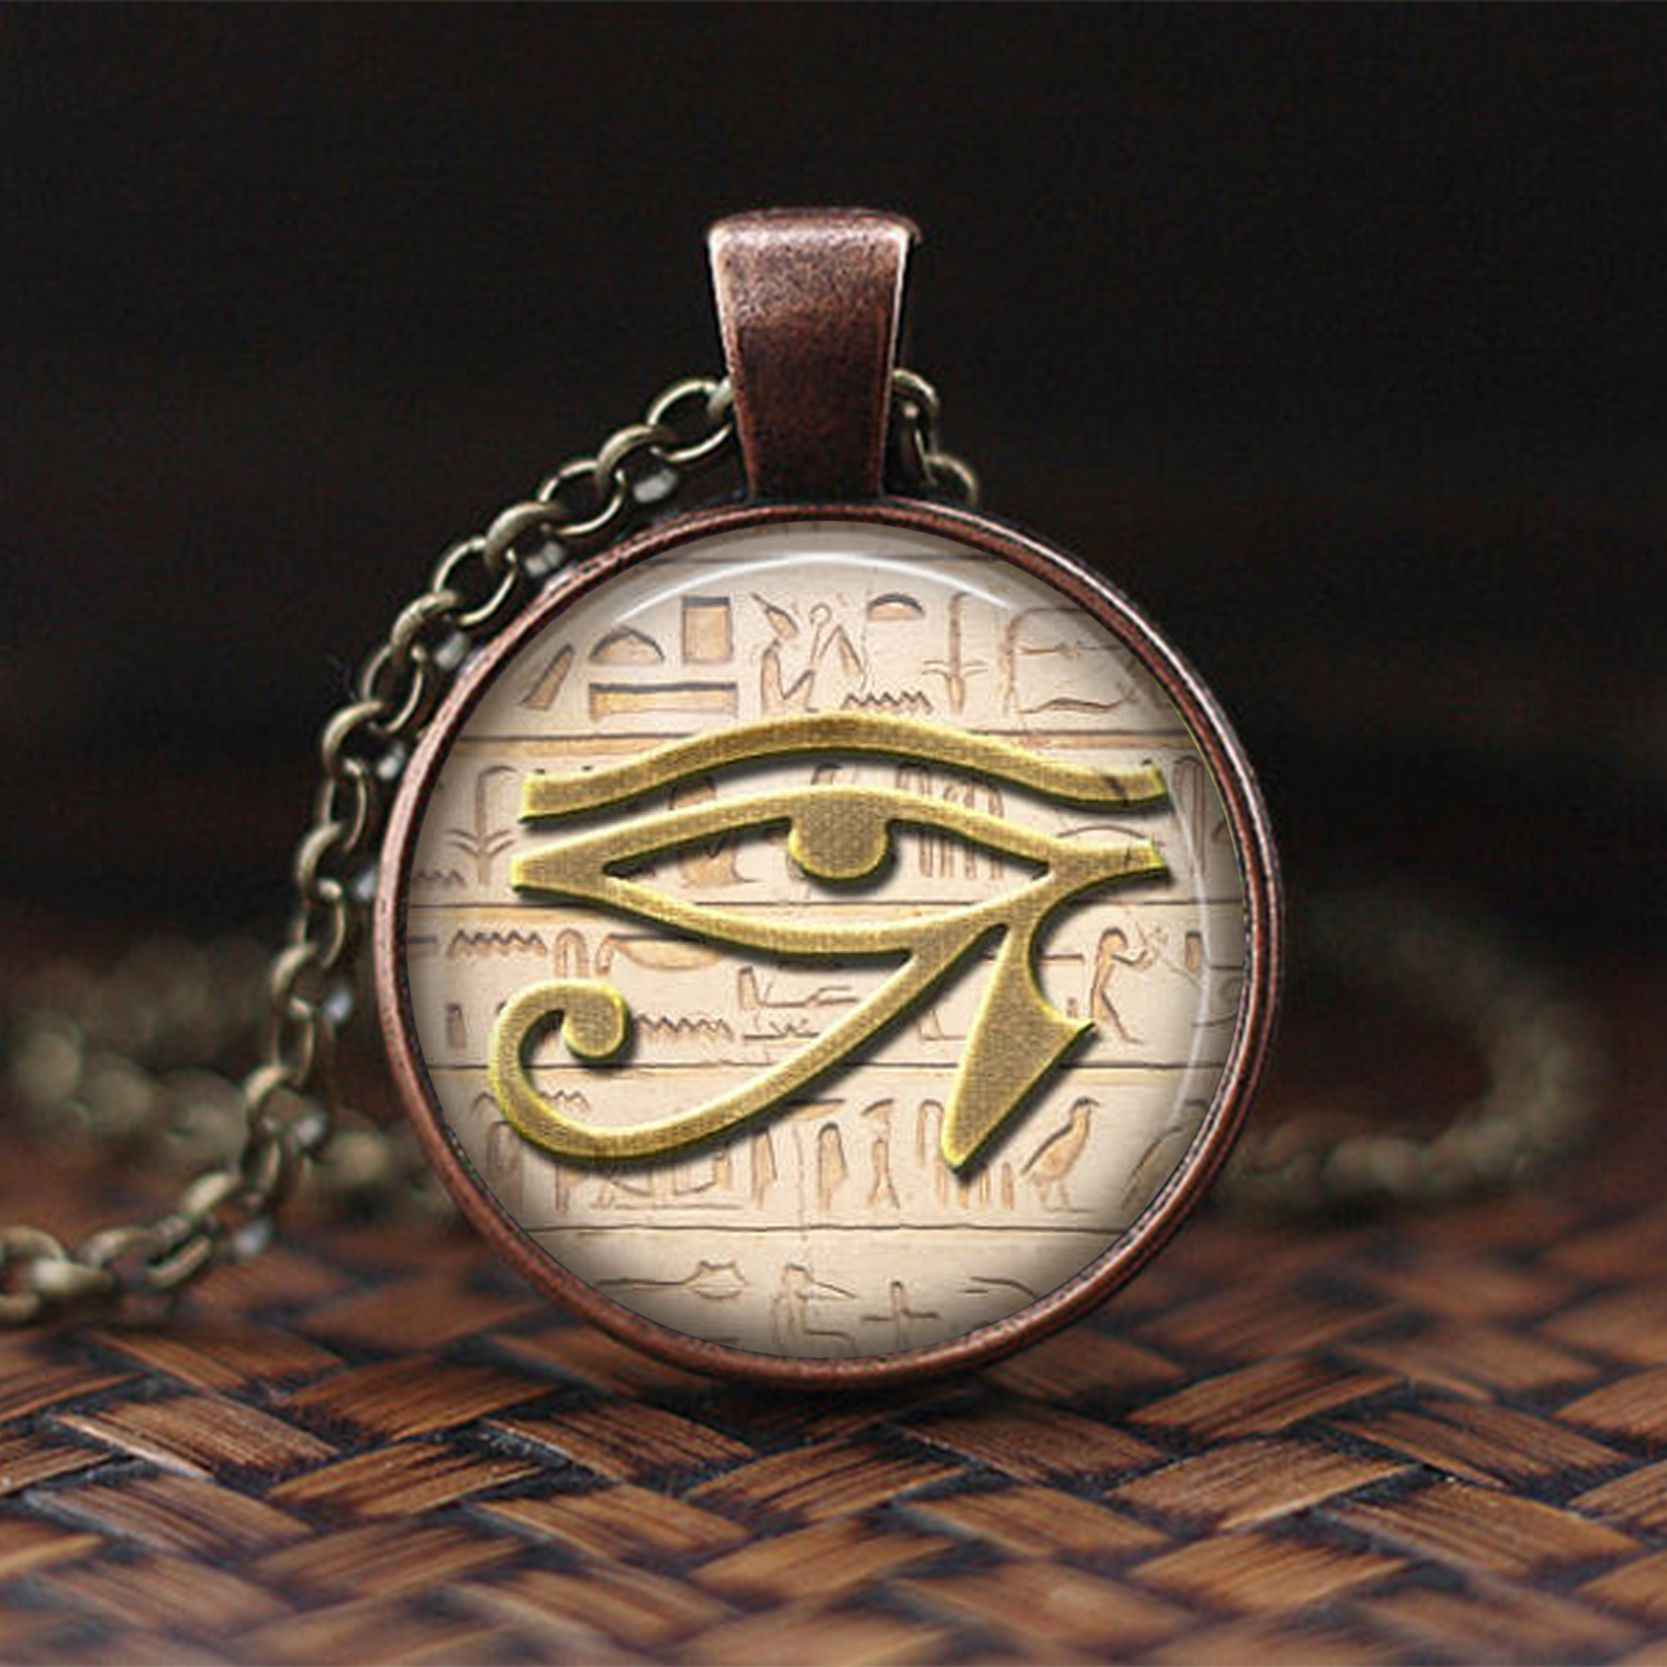 Gothic อียิปต์ Lord Of The Underworld Anubis สร้อยคอจี้ Vintage ผู้หญิงแฟชั่นเครื่องประดับของขวัญ Silver Chain แก้ว Cabochon